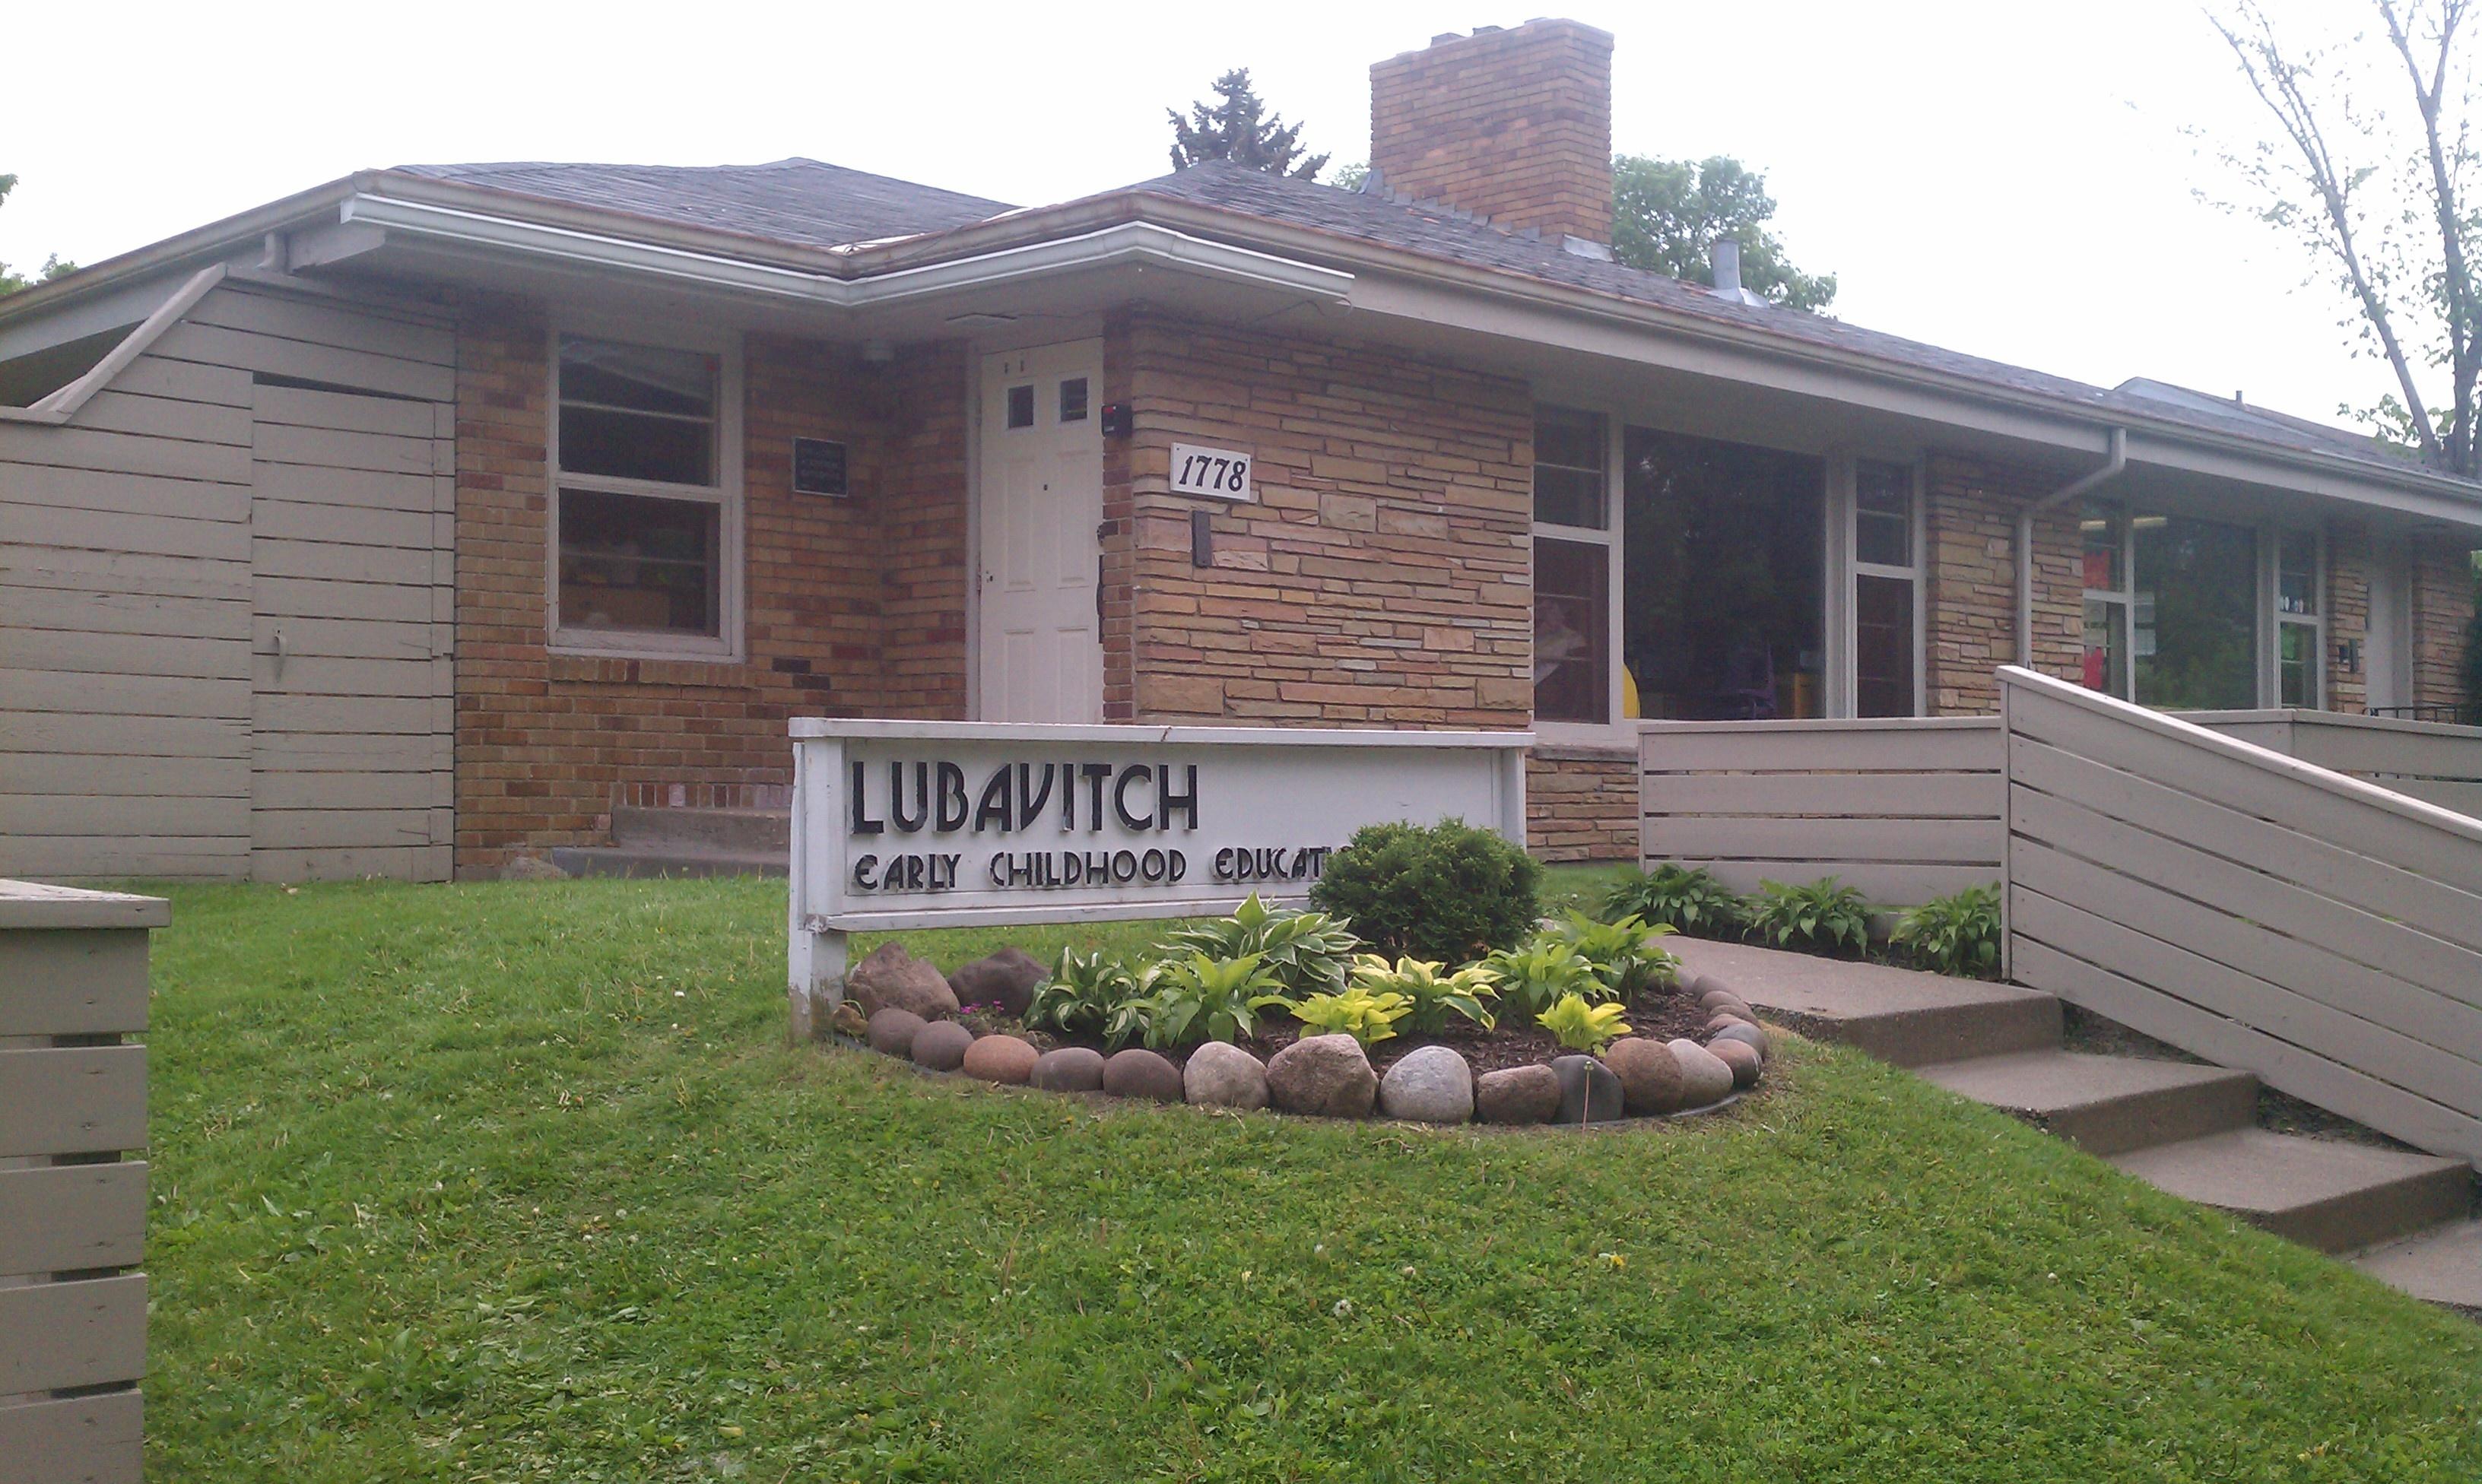 Lubavitch Early Childhood Center.jpg